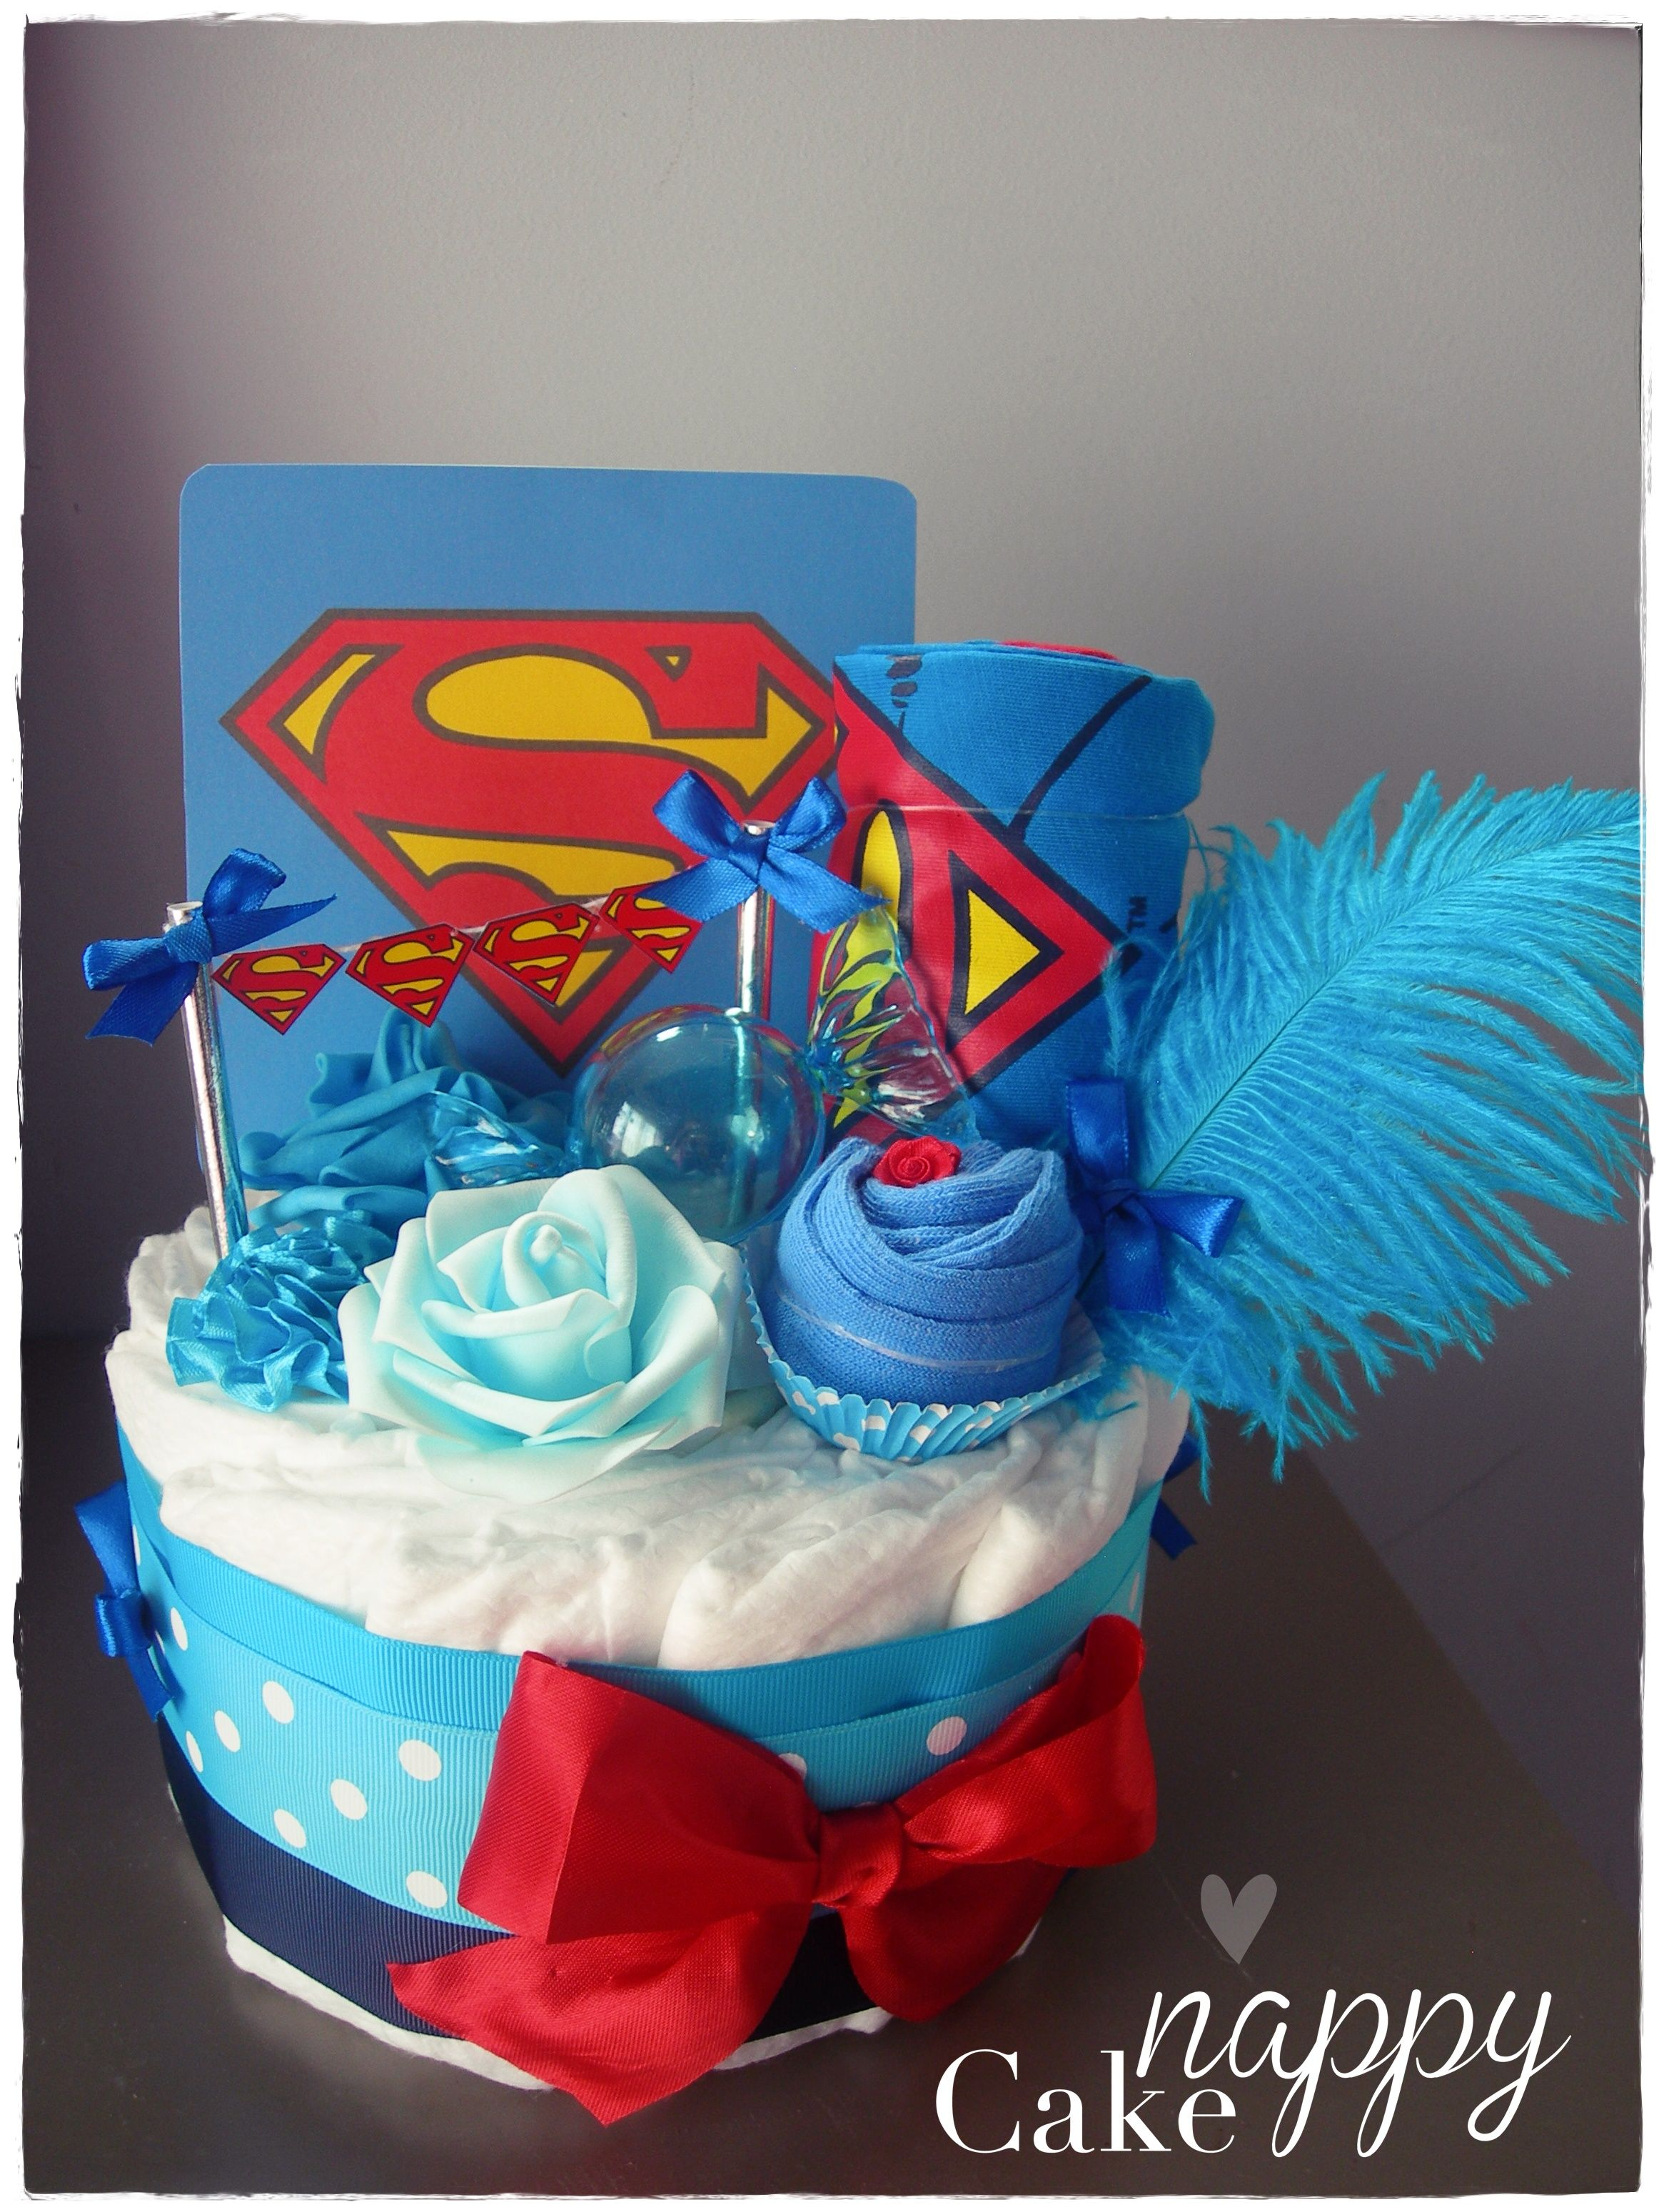 Gateau De Couches Superman Bleu Nappy Cake Cr Ations #Diapercake